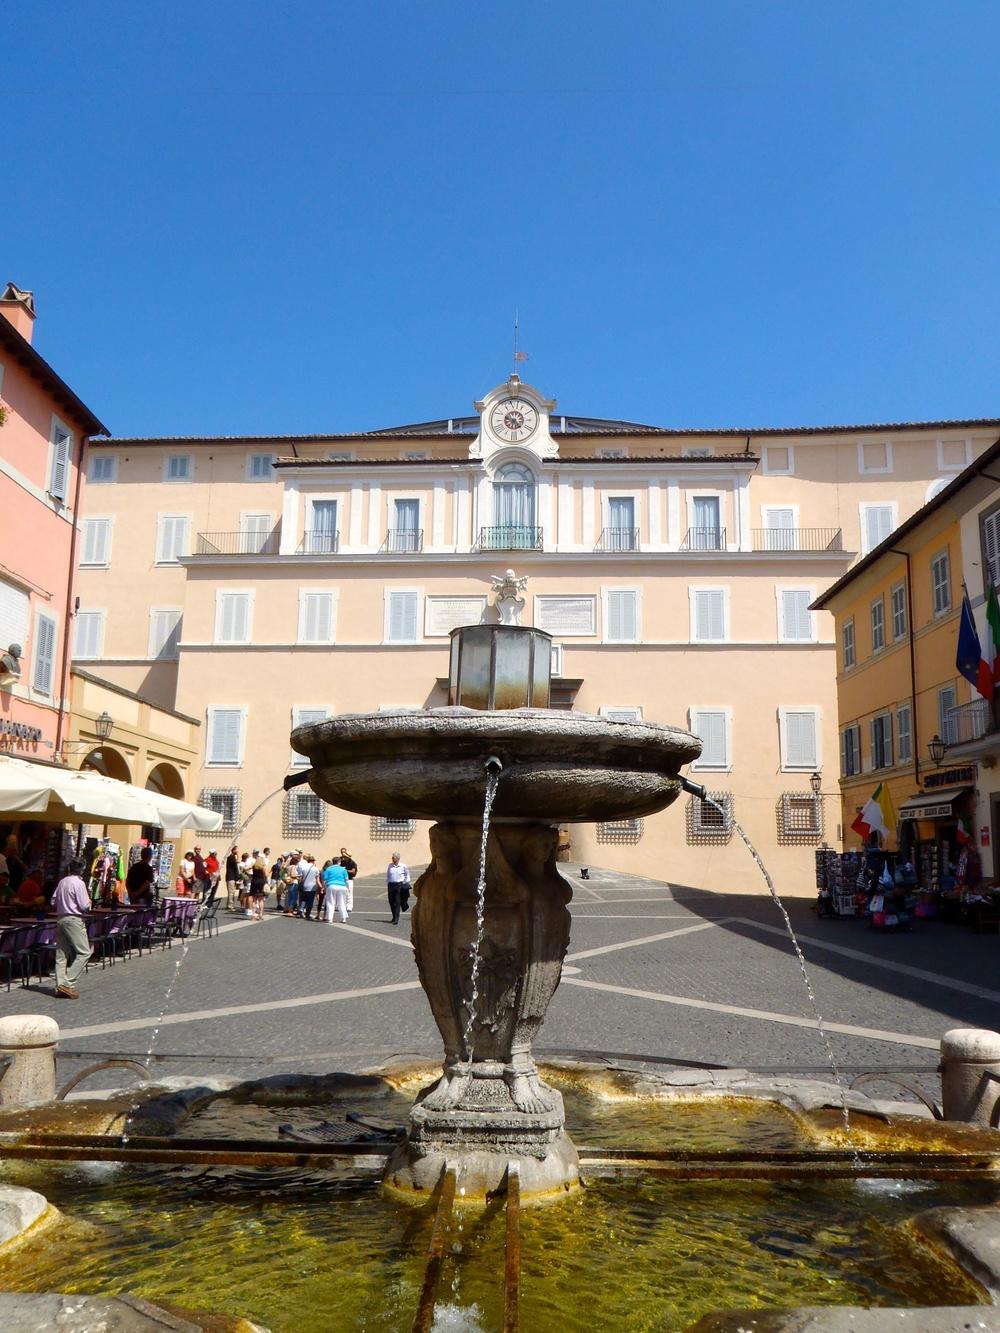 CRO Italy web 2013 - 062.jpg